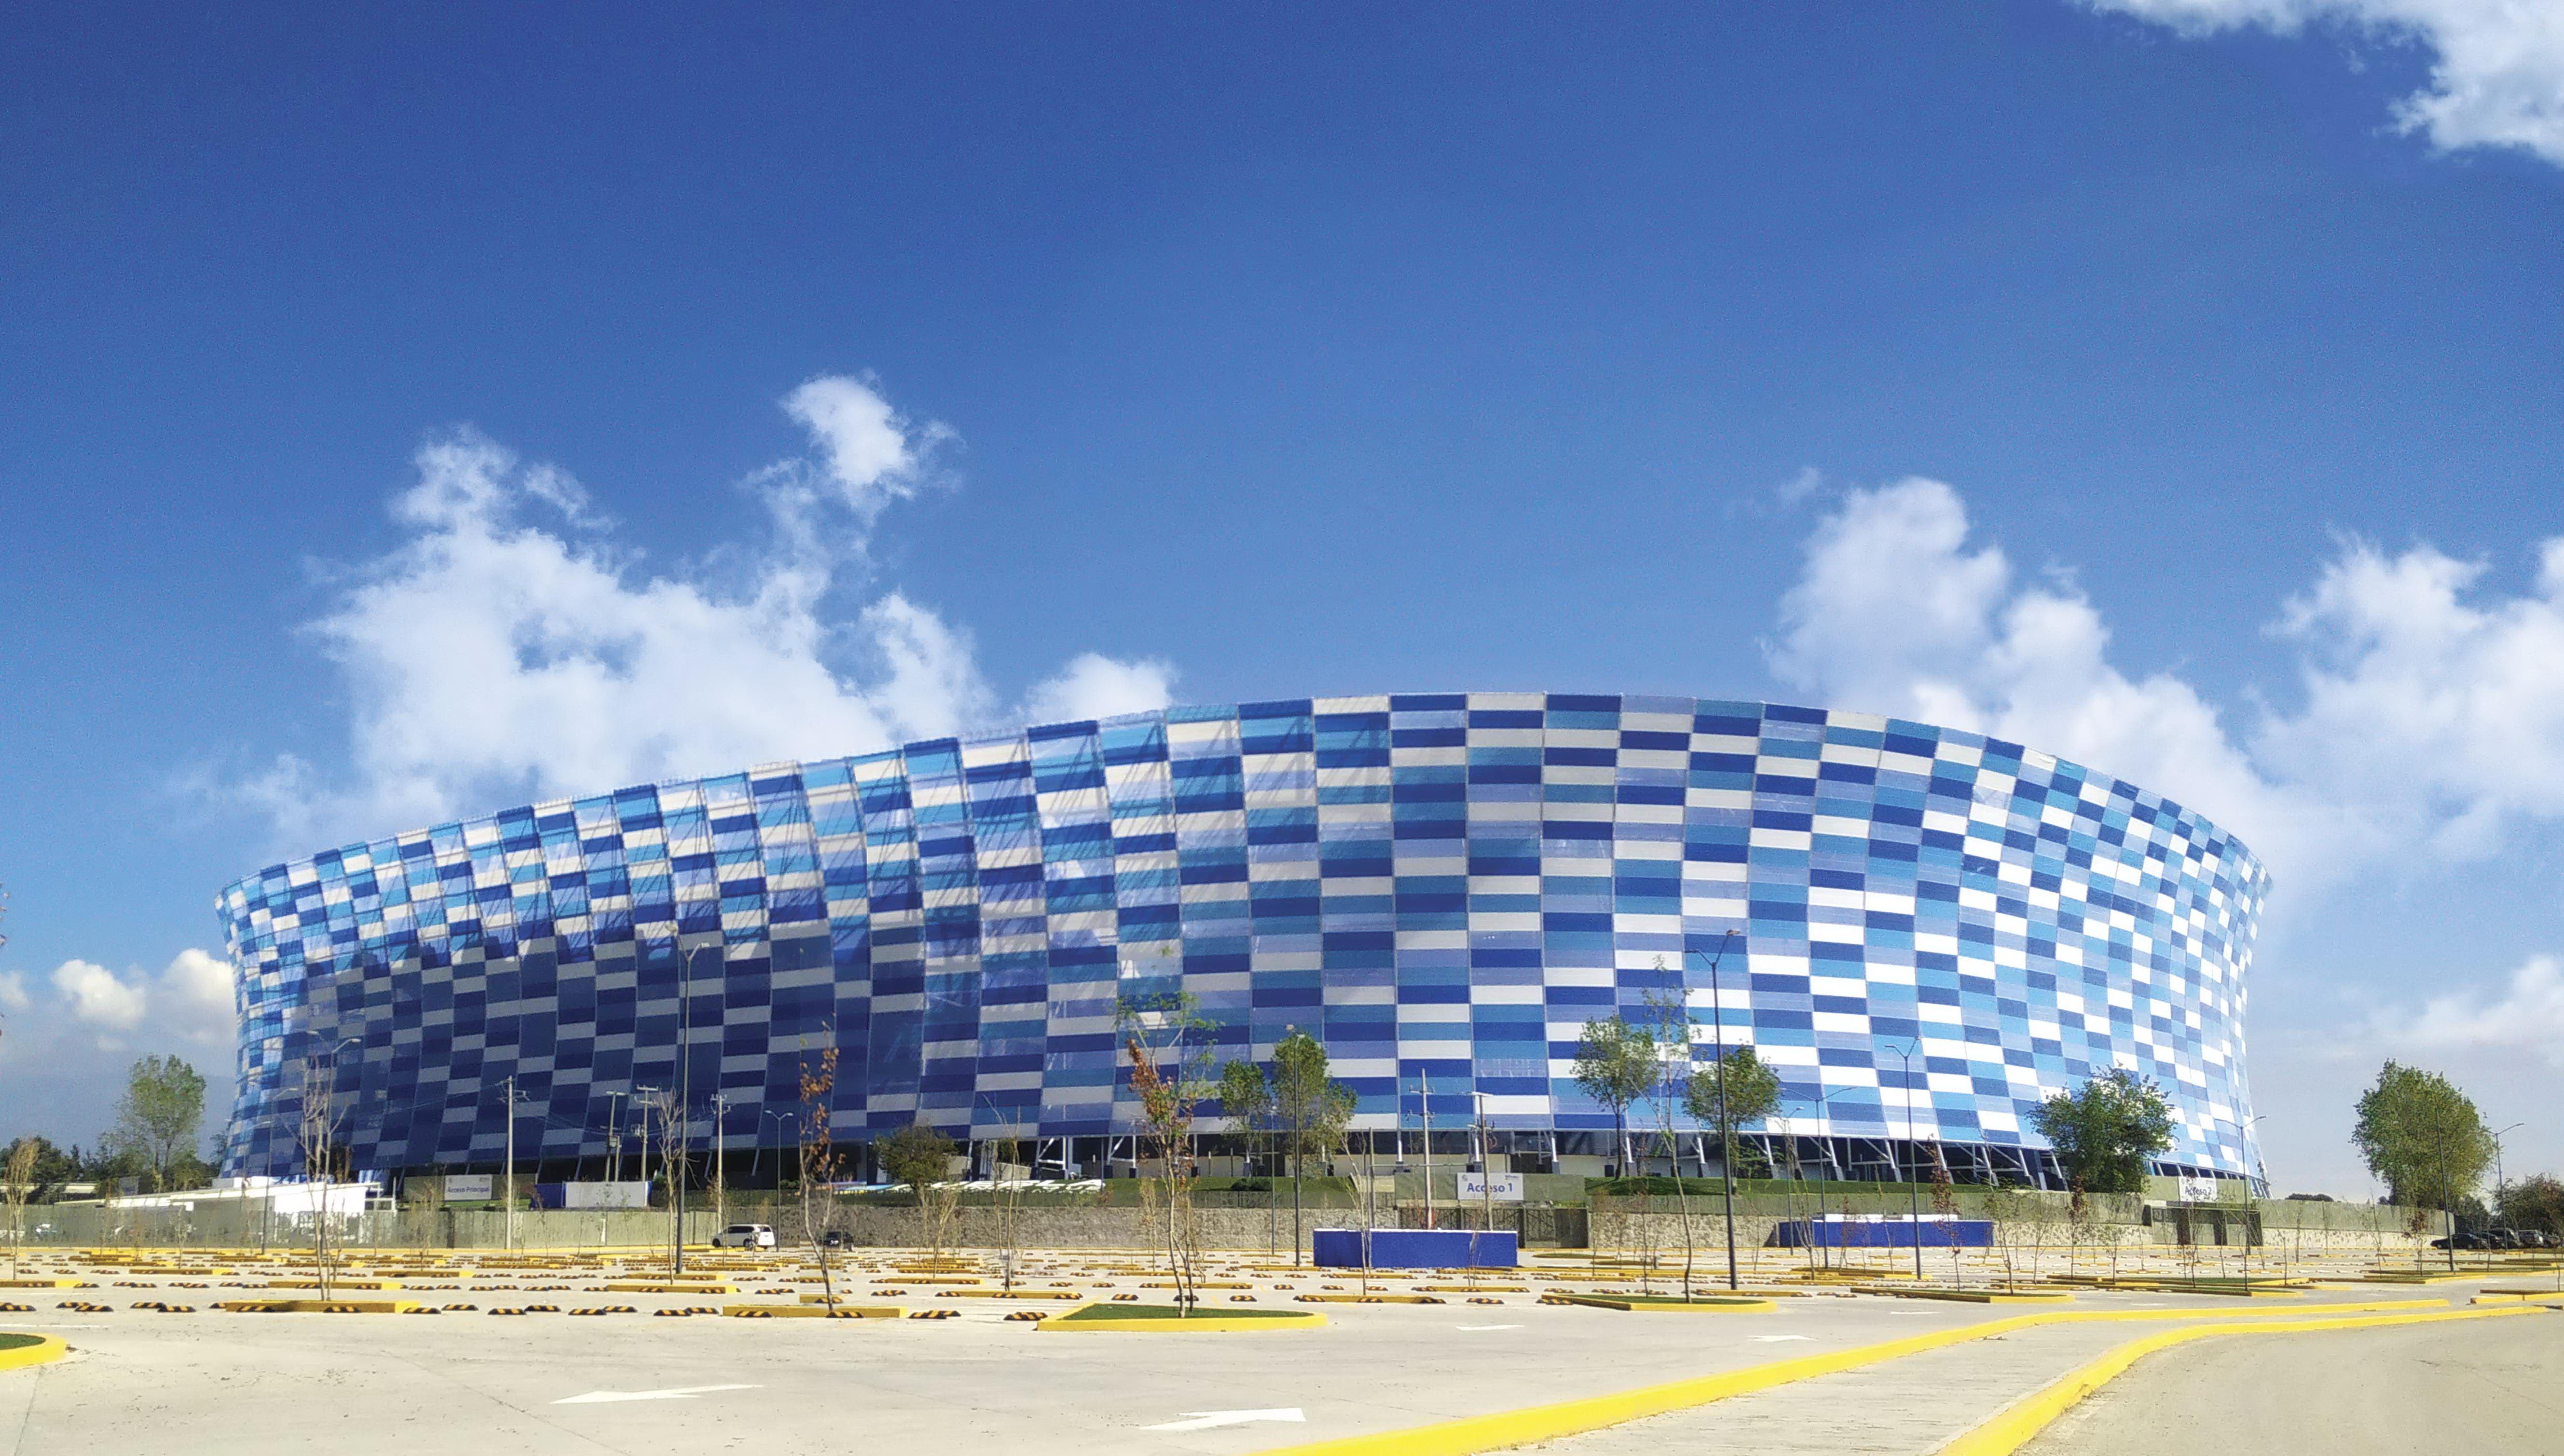 Мозаика из пленки ETFE на стадионе в Мексике